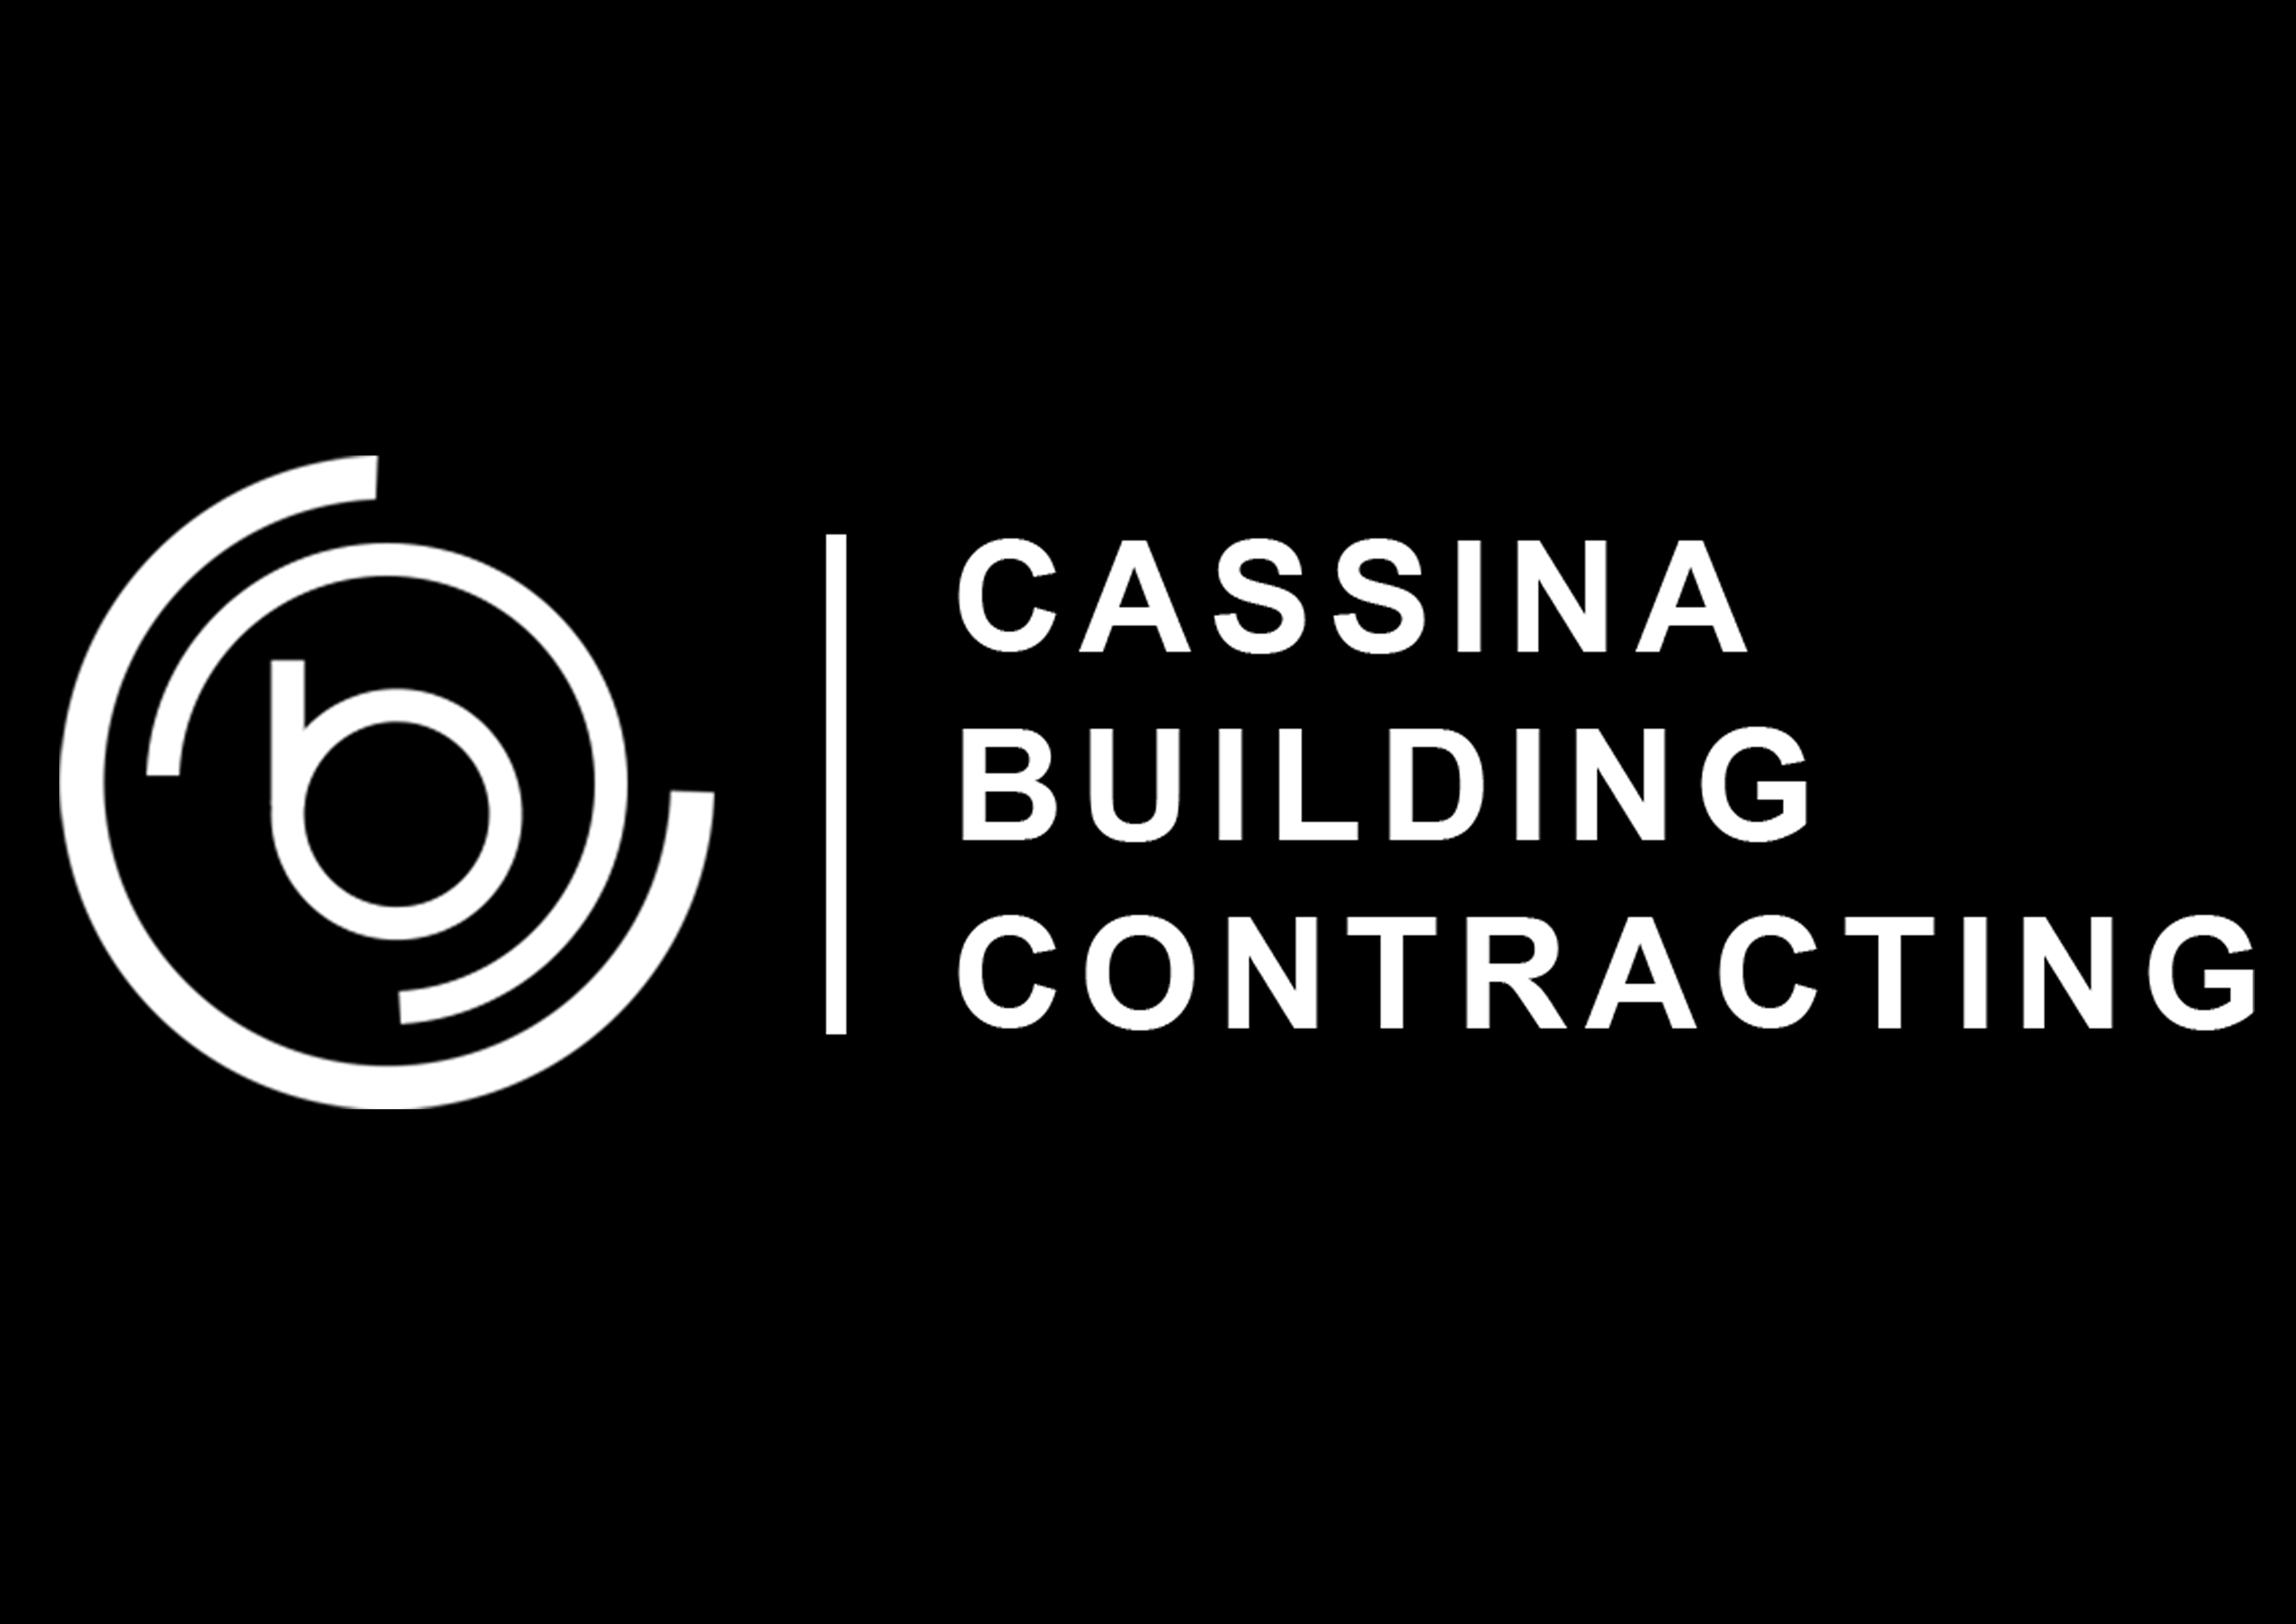 https://www.mncjobsgulf.com/company/cassina-building-contracting-llc-1594898058